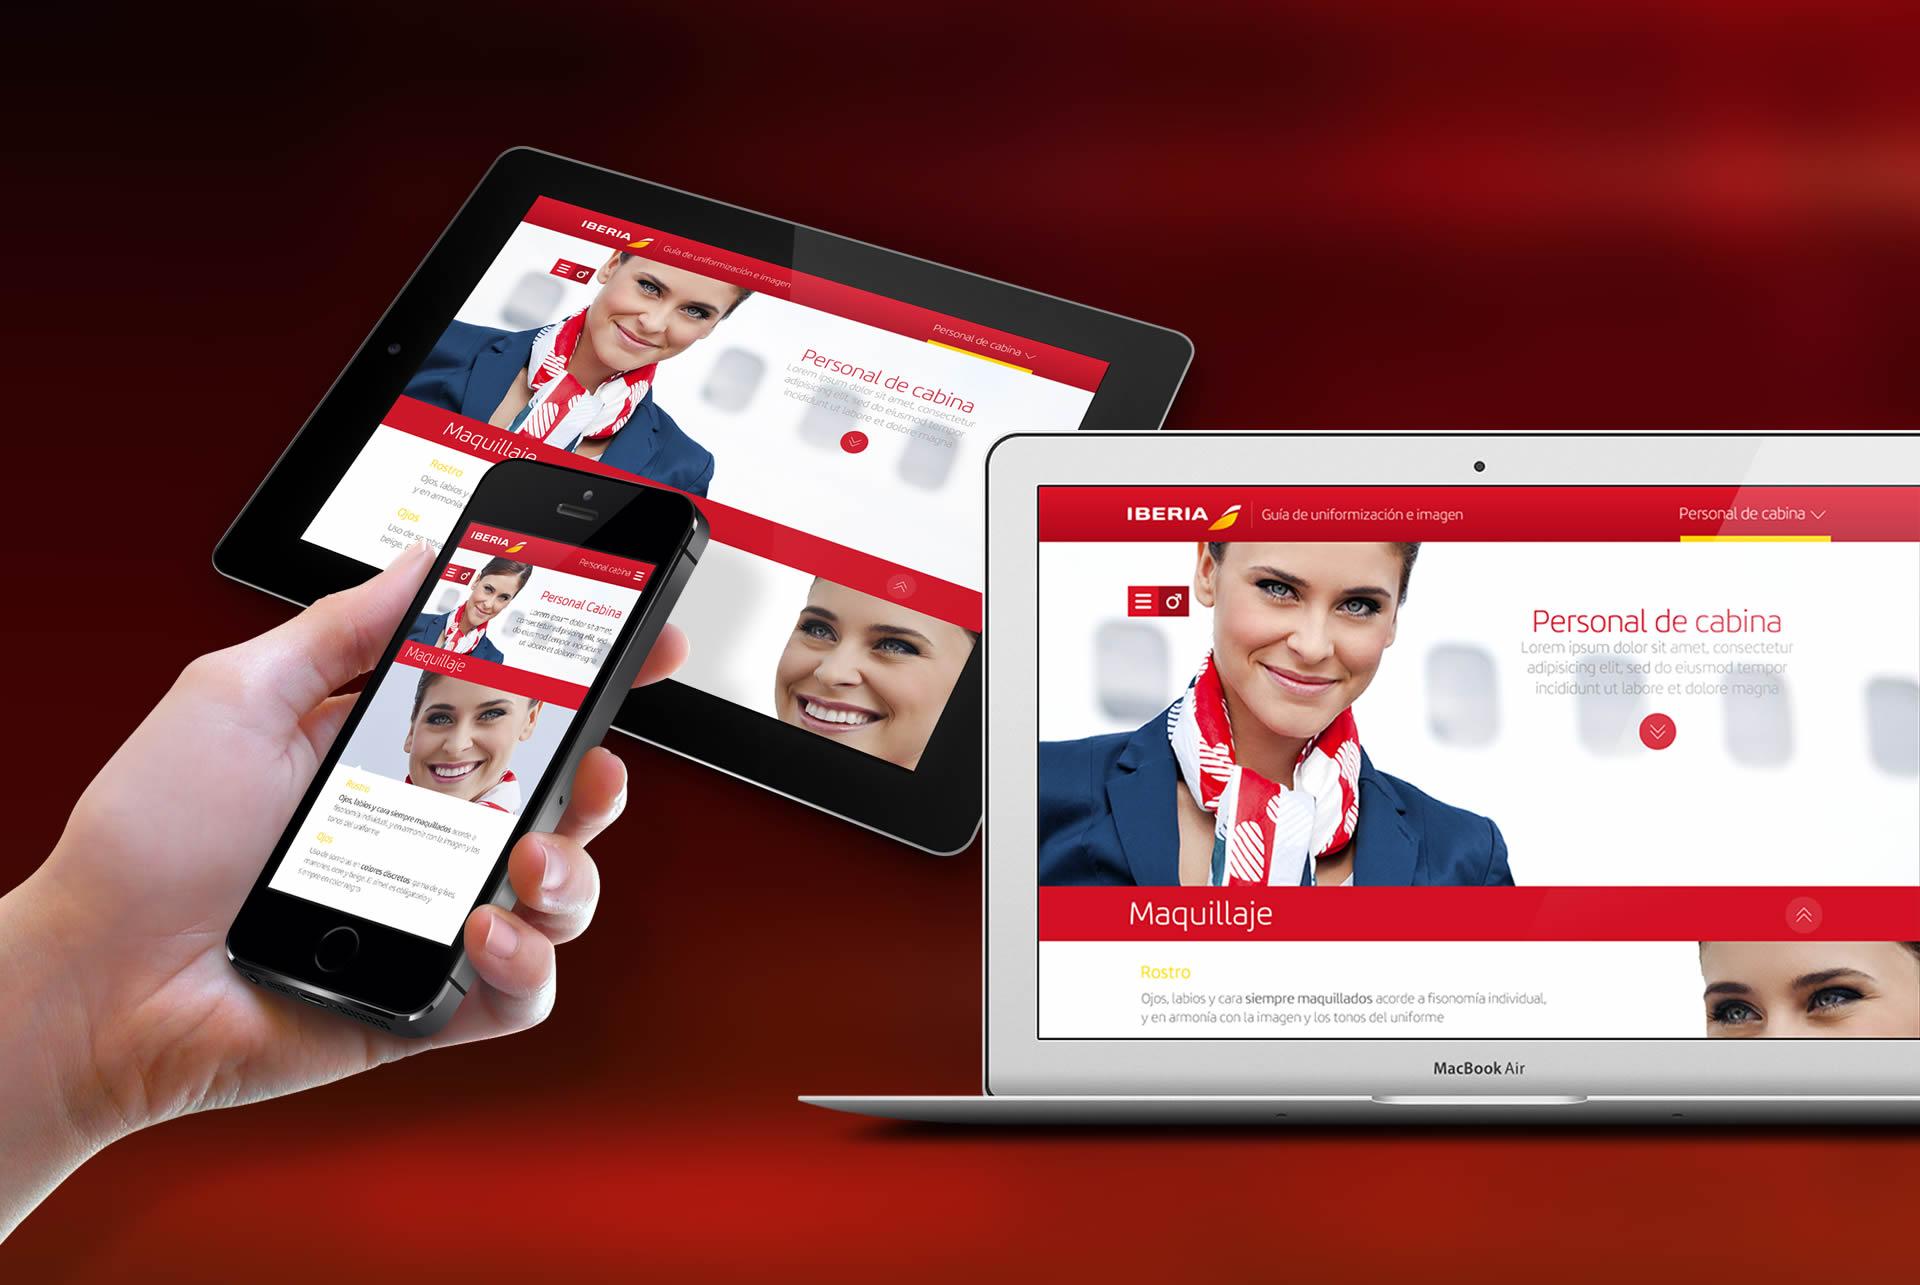 iberia-cx-experiencia-cliente-babel-apttitud-responsive-html5-css